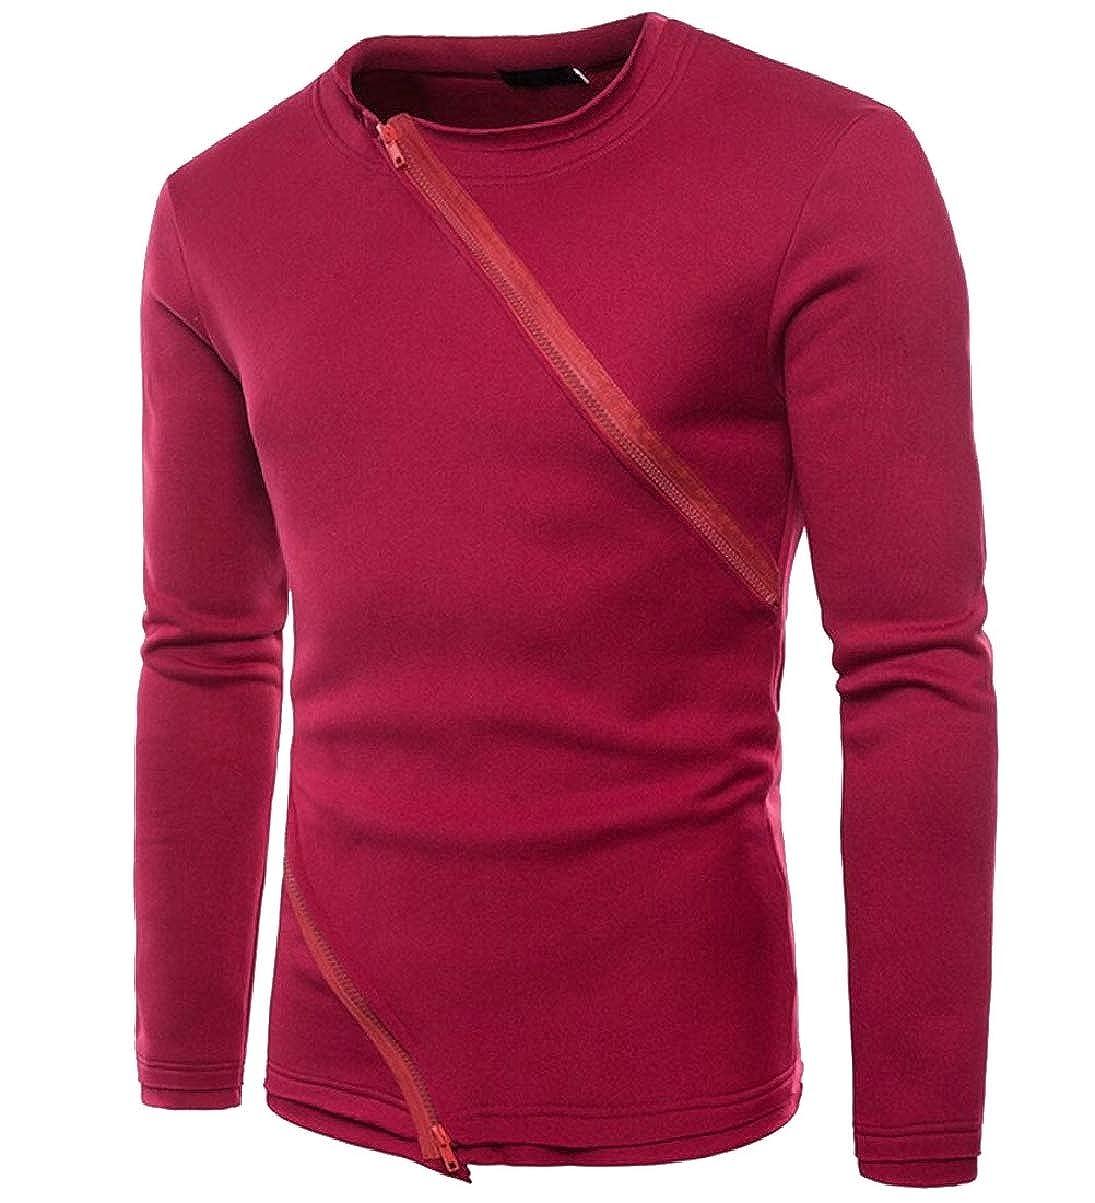 CBTLVSN Mens Autumn Crewneck Double Zipper Stitching Asymmetrical Sweatshirts